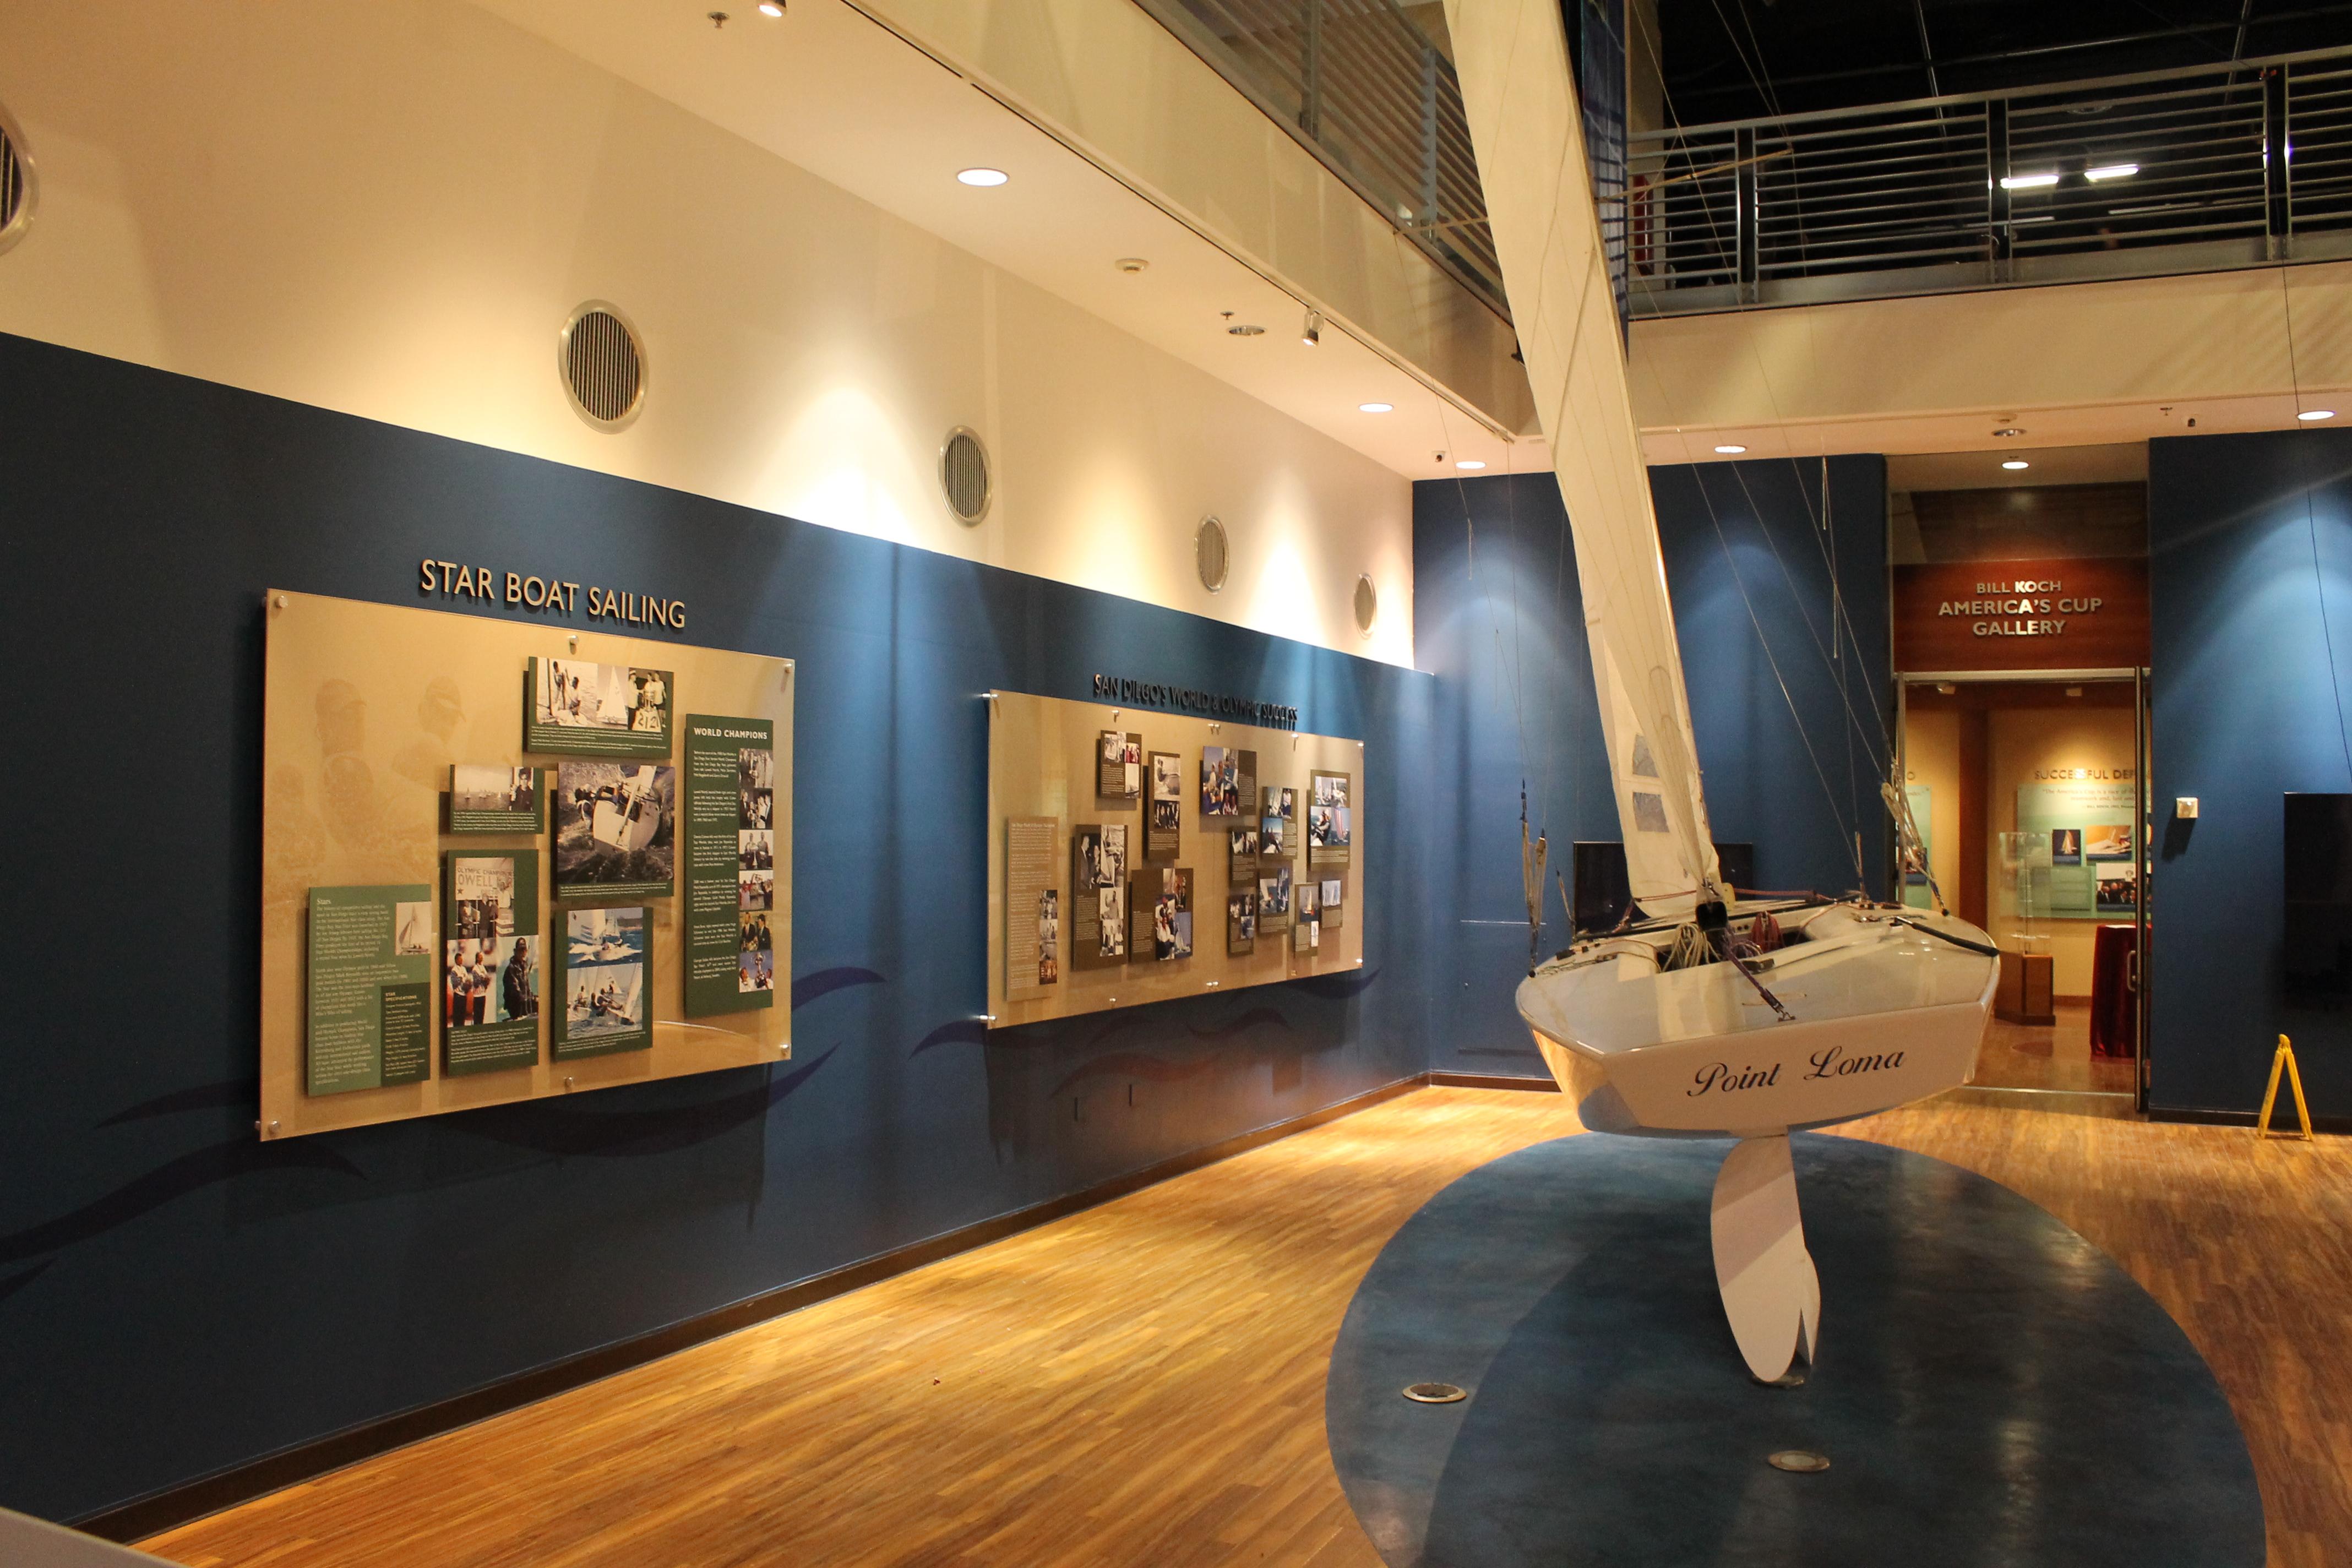 Theater Foyer & Sailing Exhibit